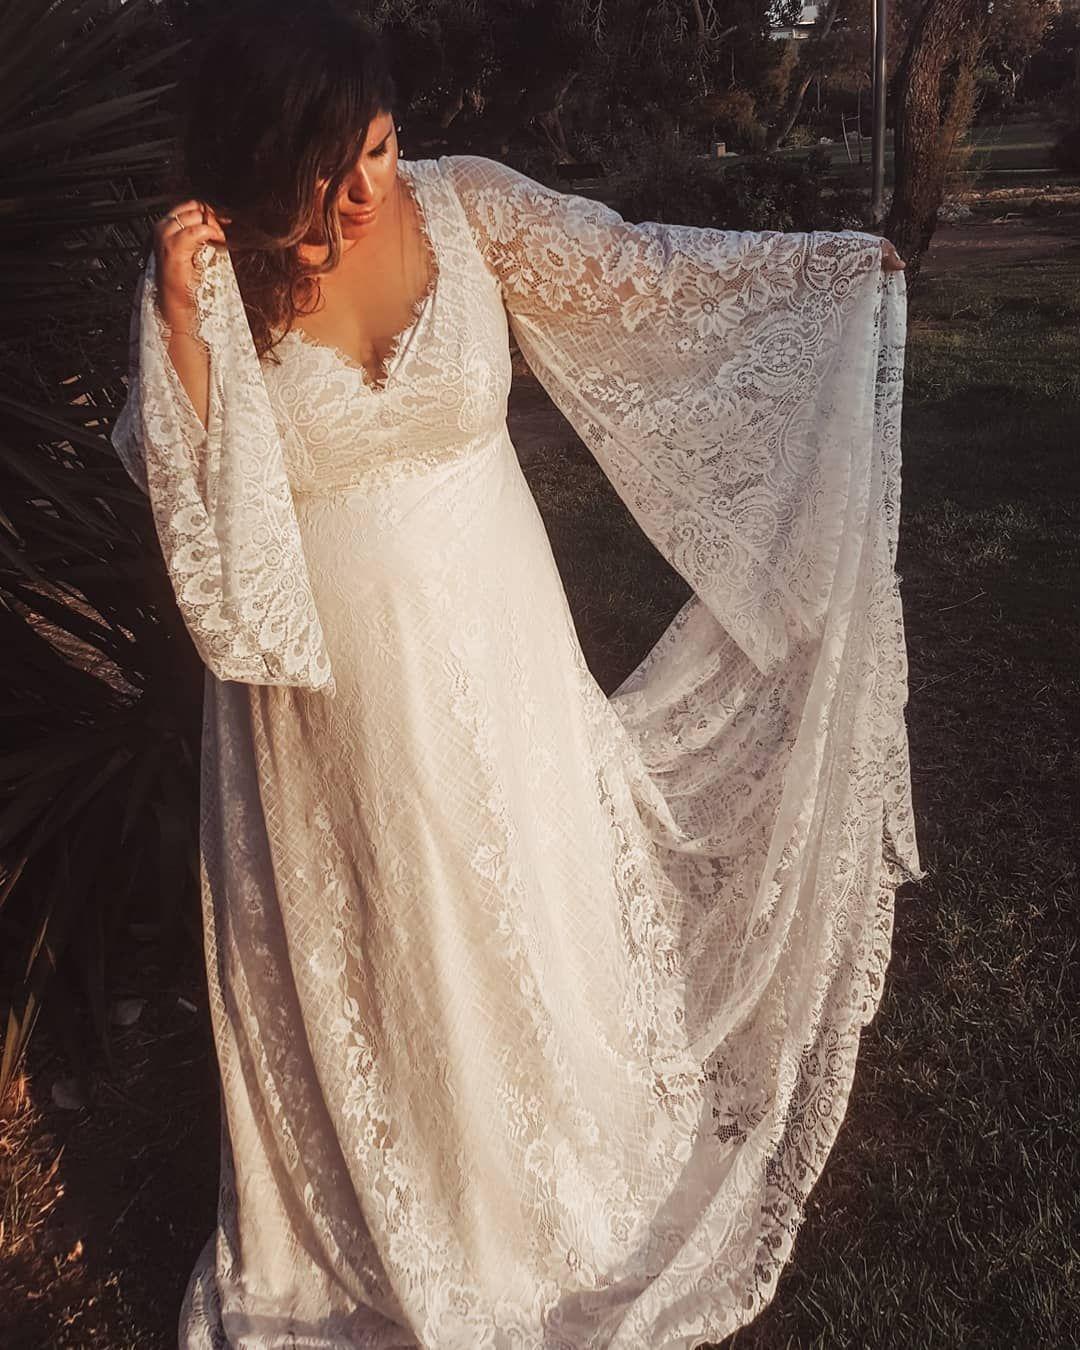 Bohemian Romantic Blush Plus Size Wedding Dress With Gorgeous Bell Sleeves Long Train An Bell Sleeve Wedding Dress Wedding Dresses Boho Wedding Dress Bohemian [ 1350 x 1080 Pixel ]